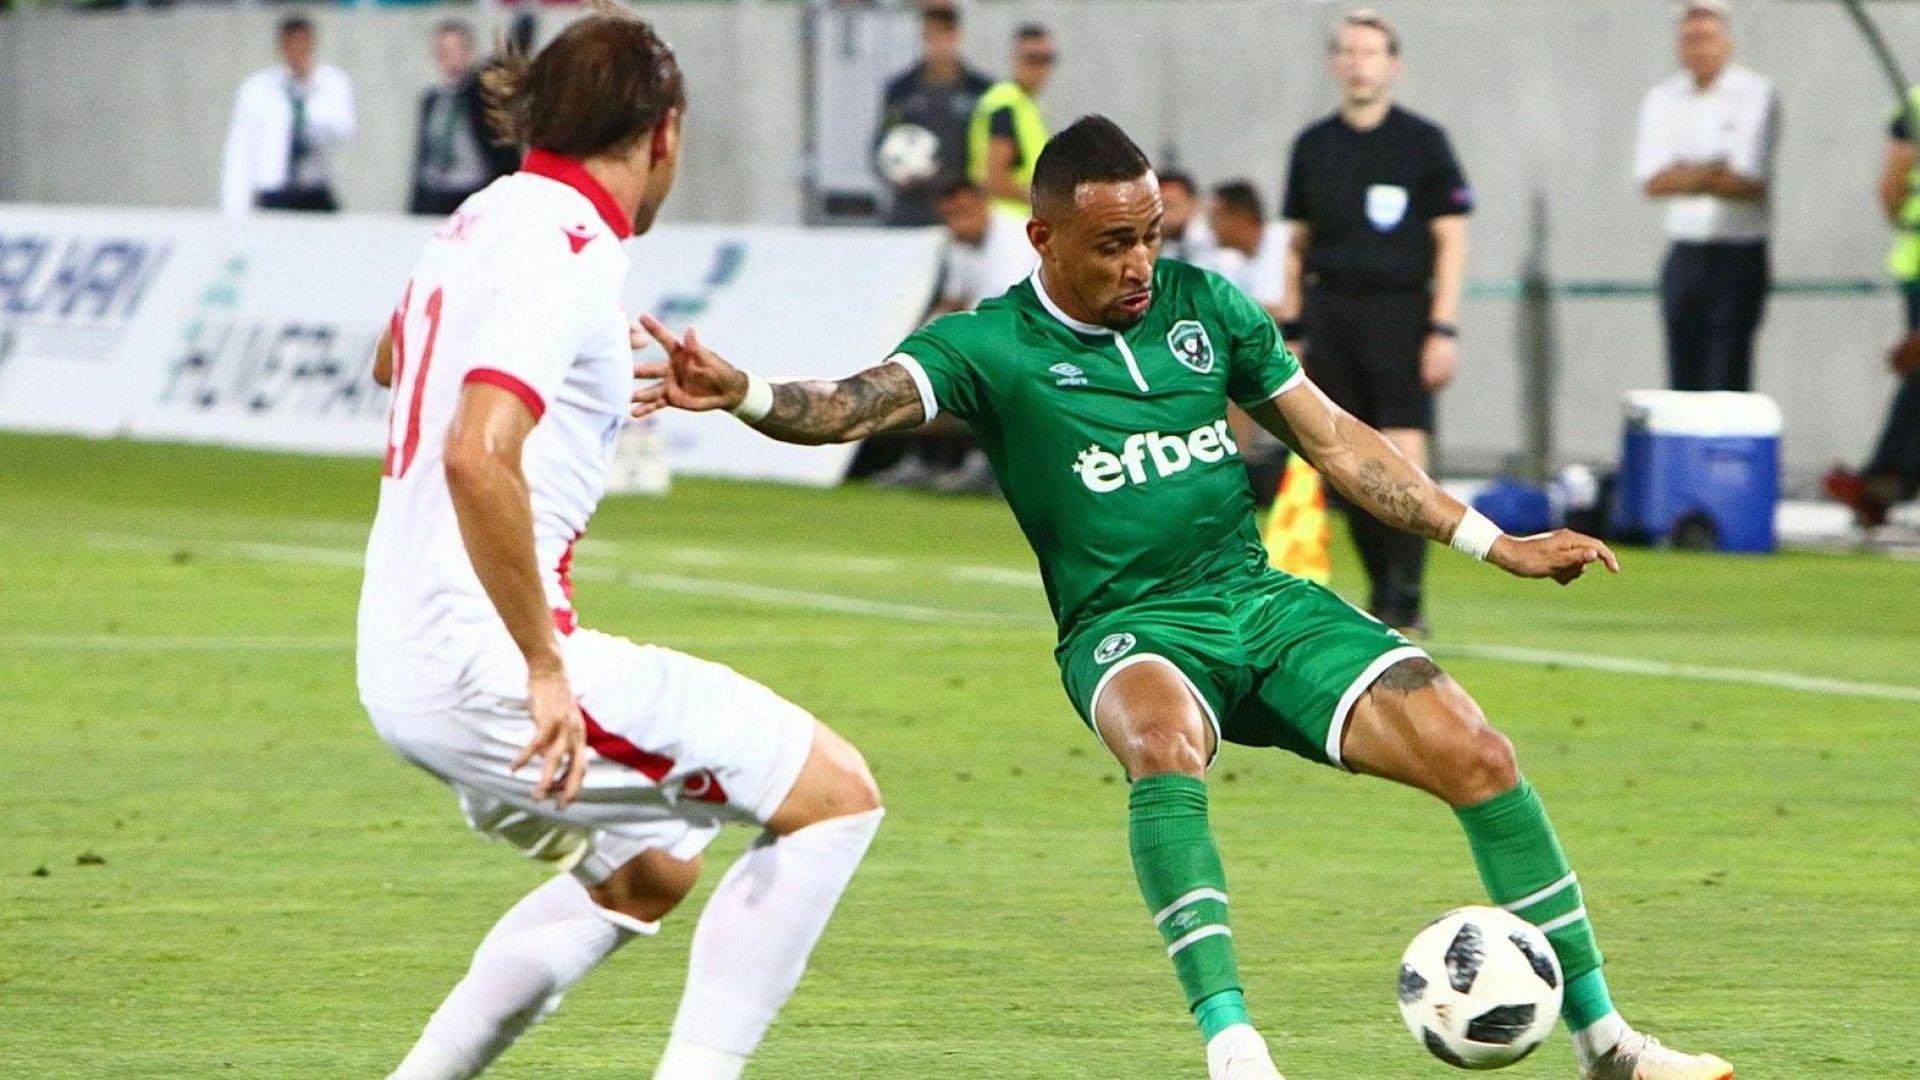 Футболисти за 145 милиона евро играят по родните терени